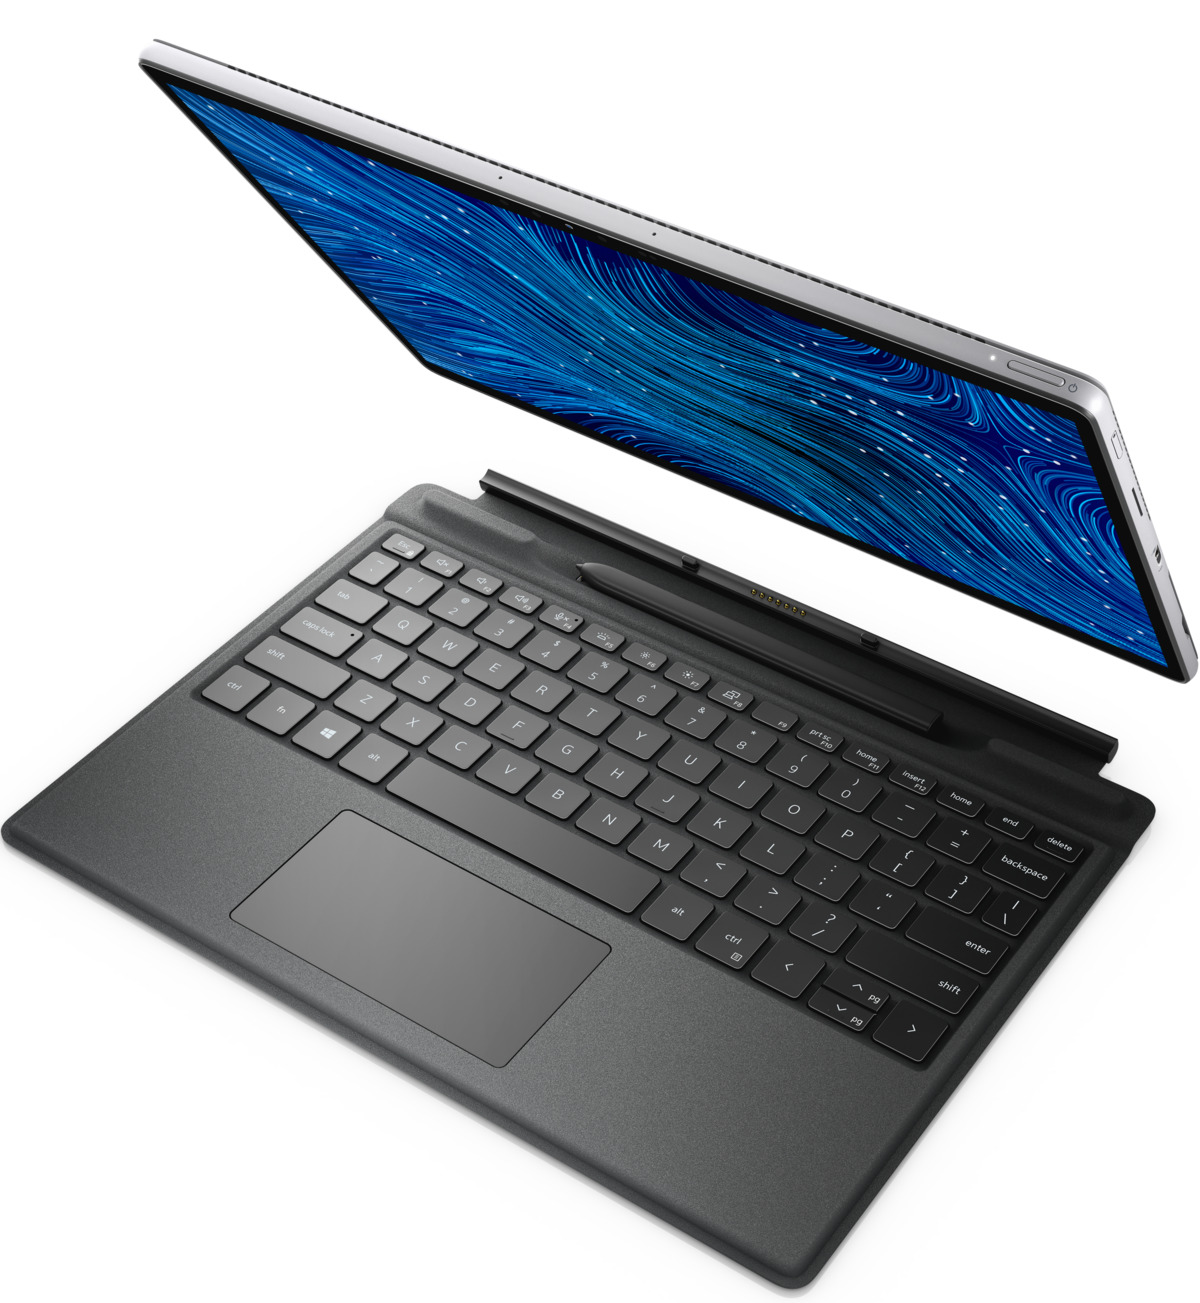 dell latitude 7320 detachable keyboard detached